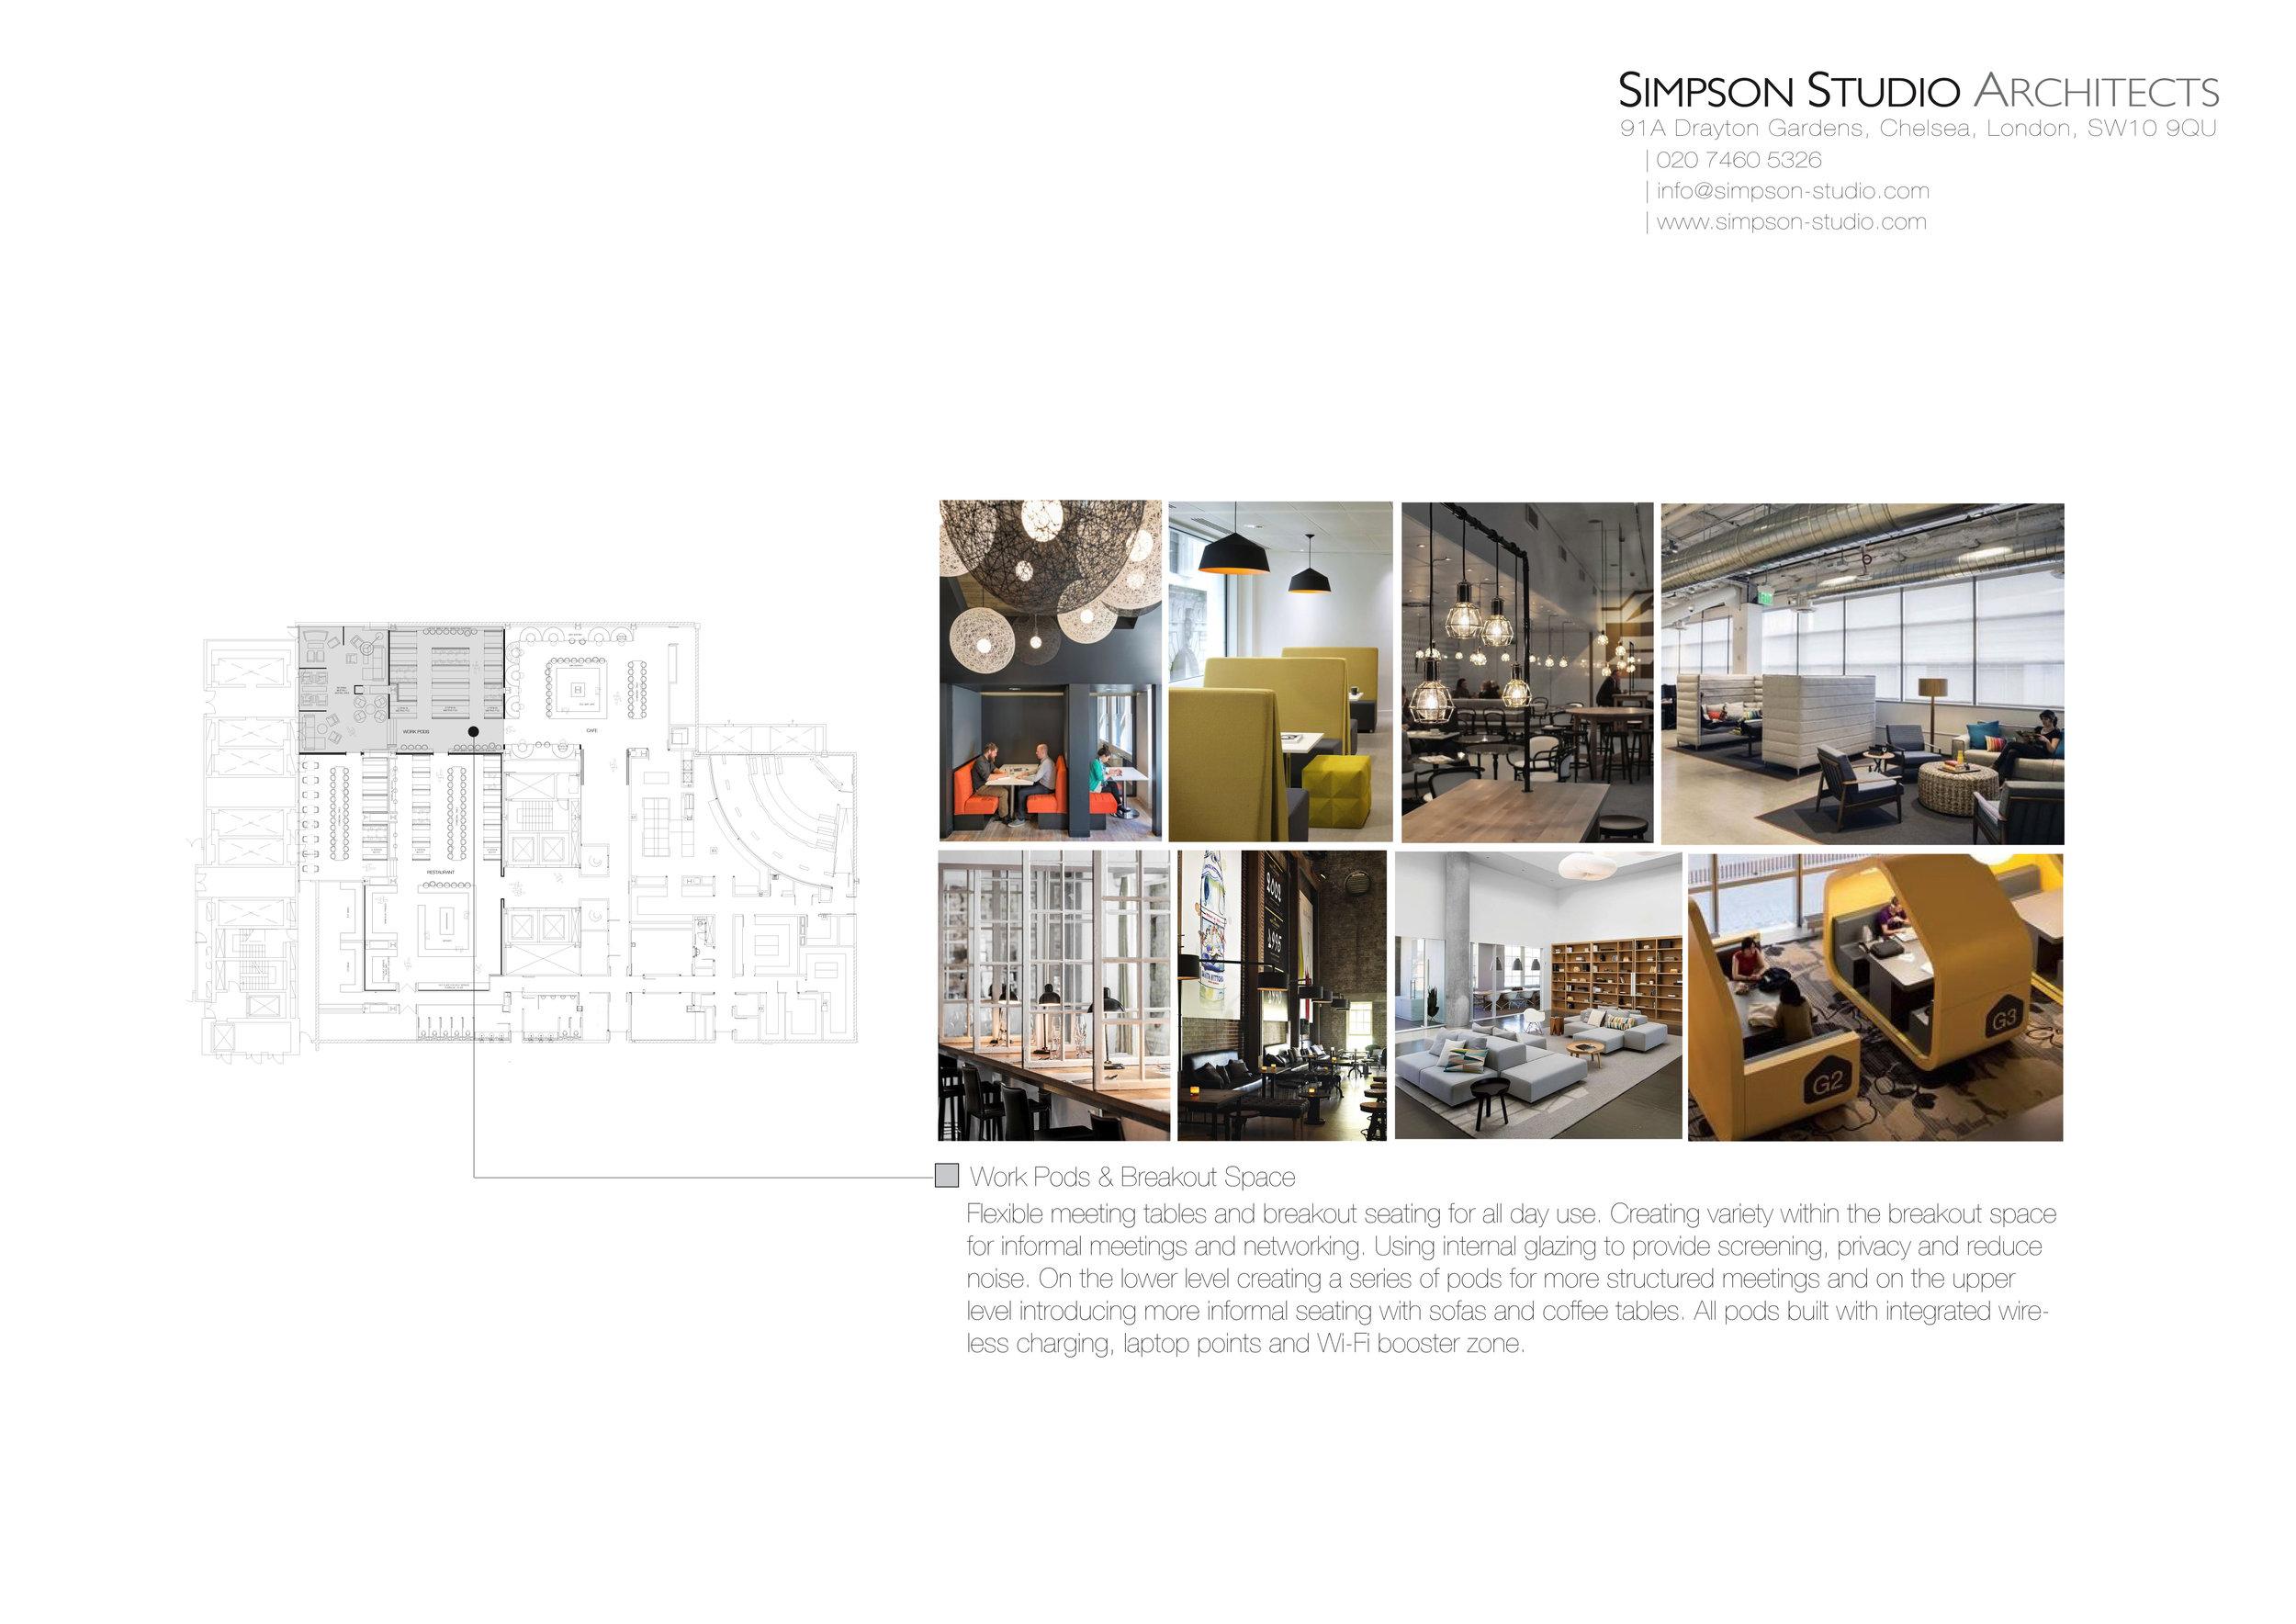 1608_Restaurant Concepts-6.jpg